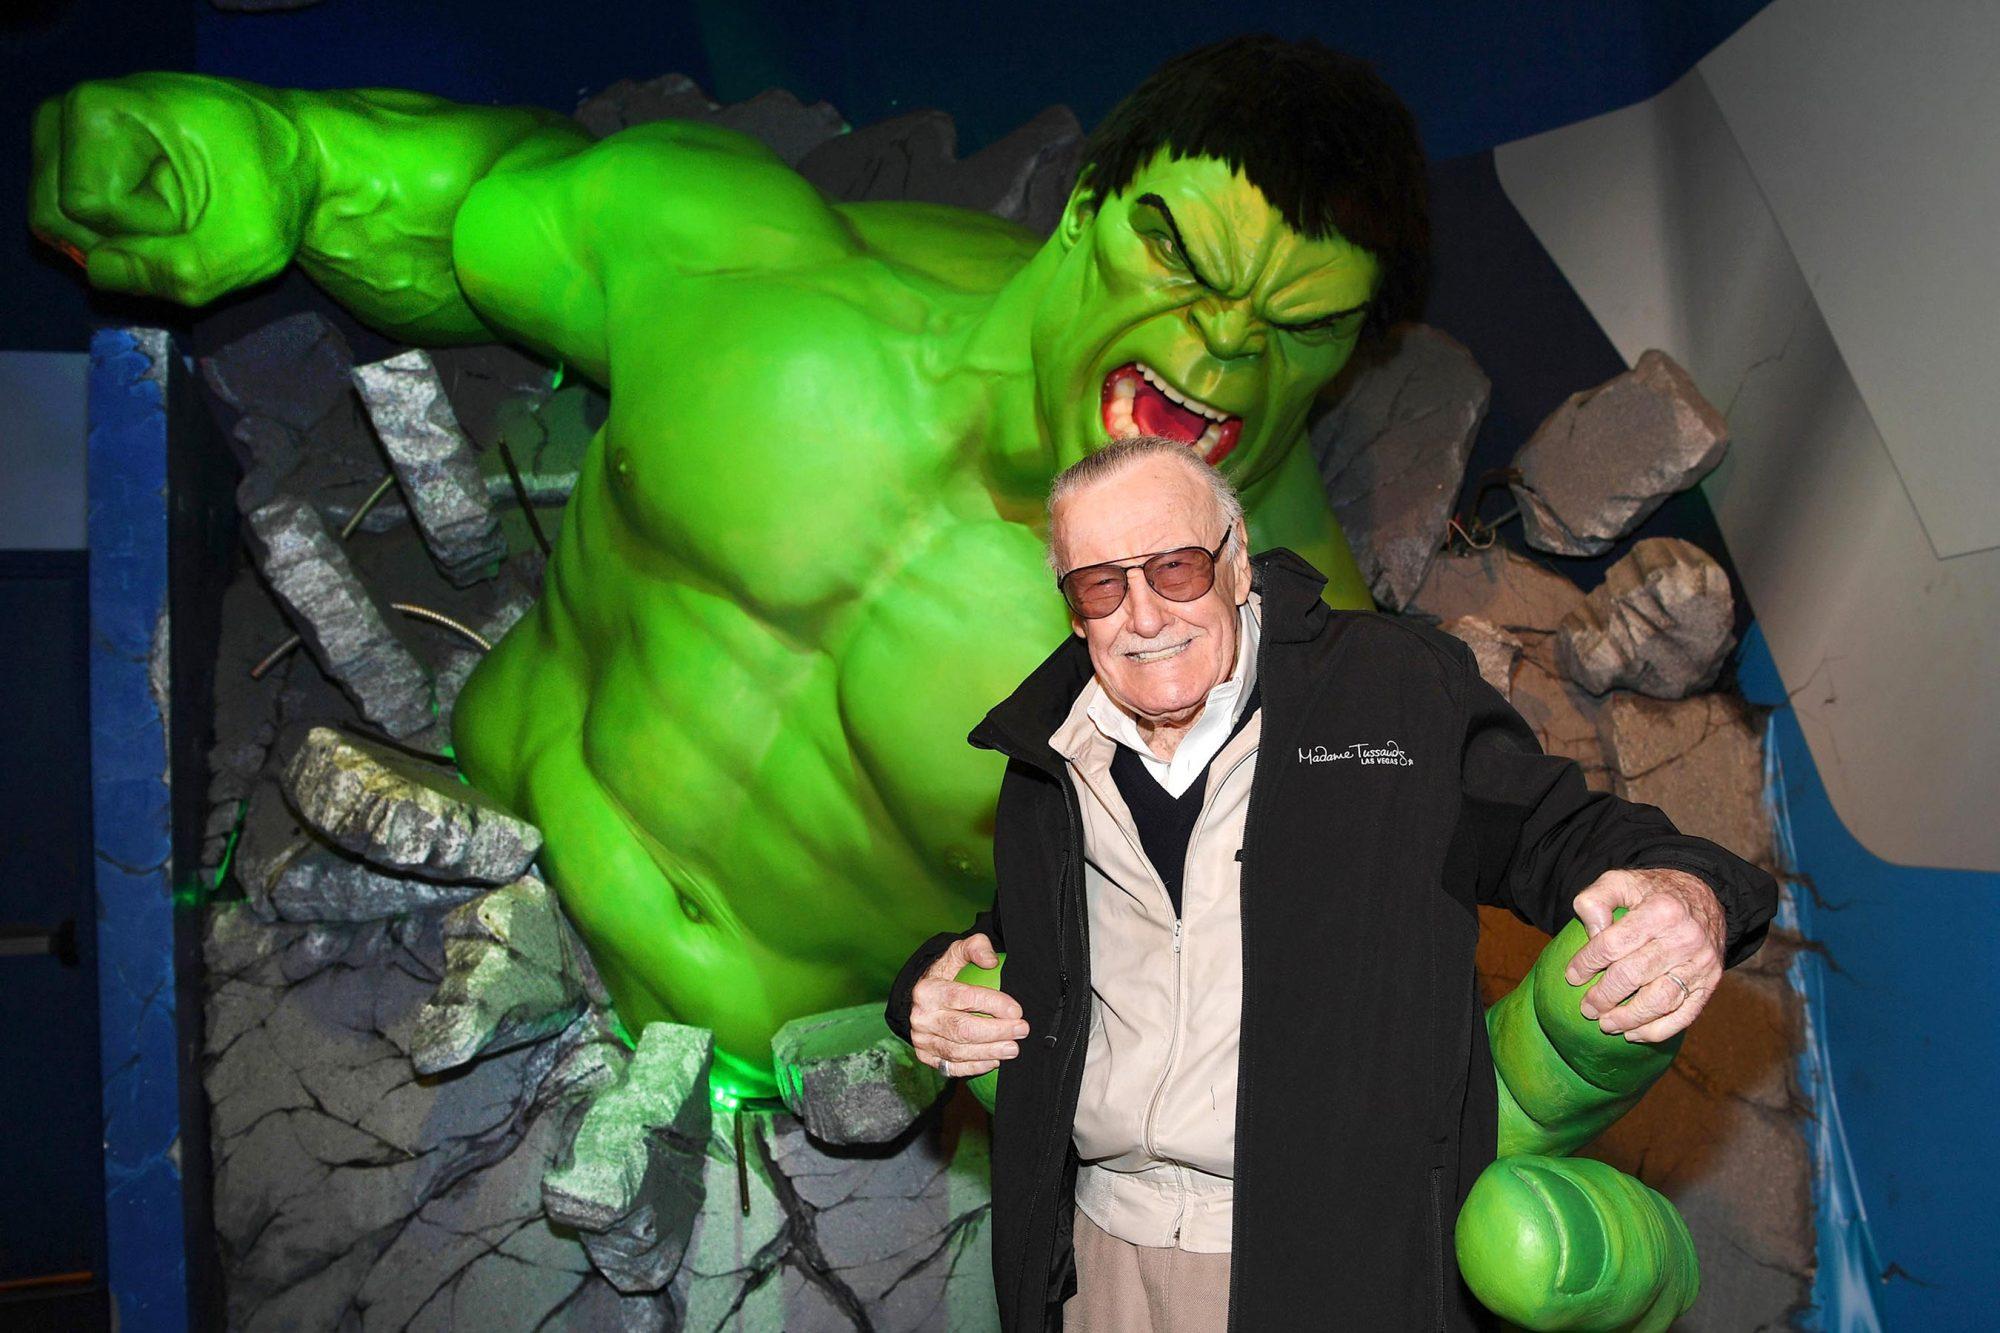 Madame Tussauds Las Vegas And Marvel Unveils Brand New Hulkbuster Figure With Iconic Marvel Mastermind, Stan Lee